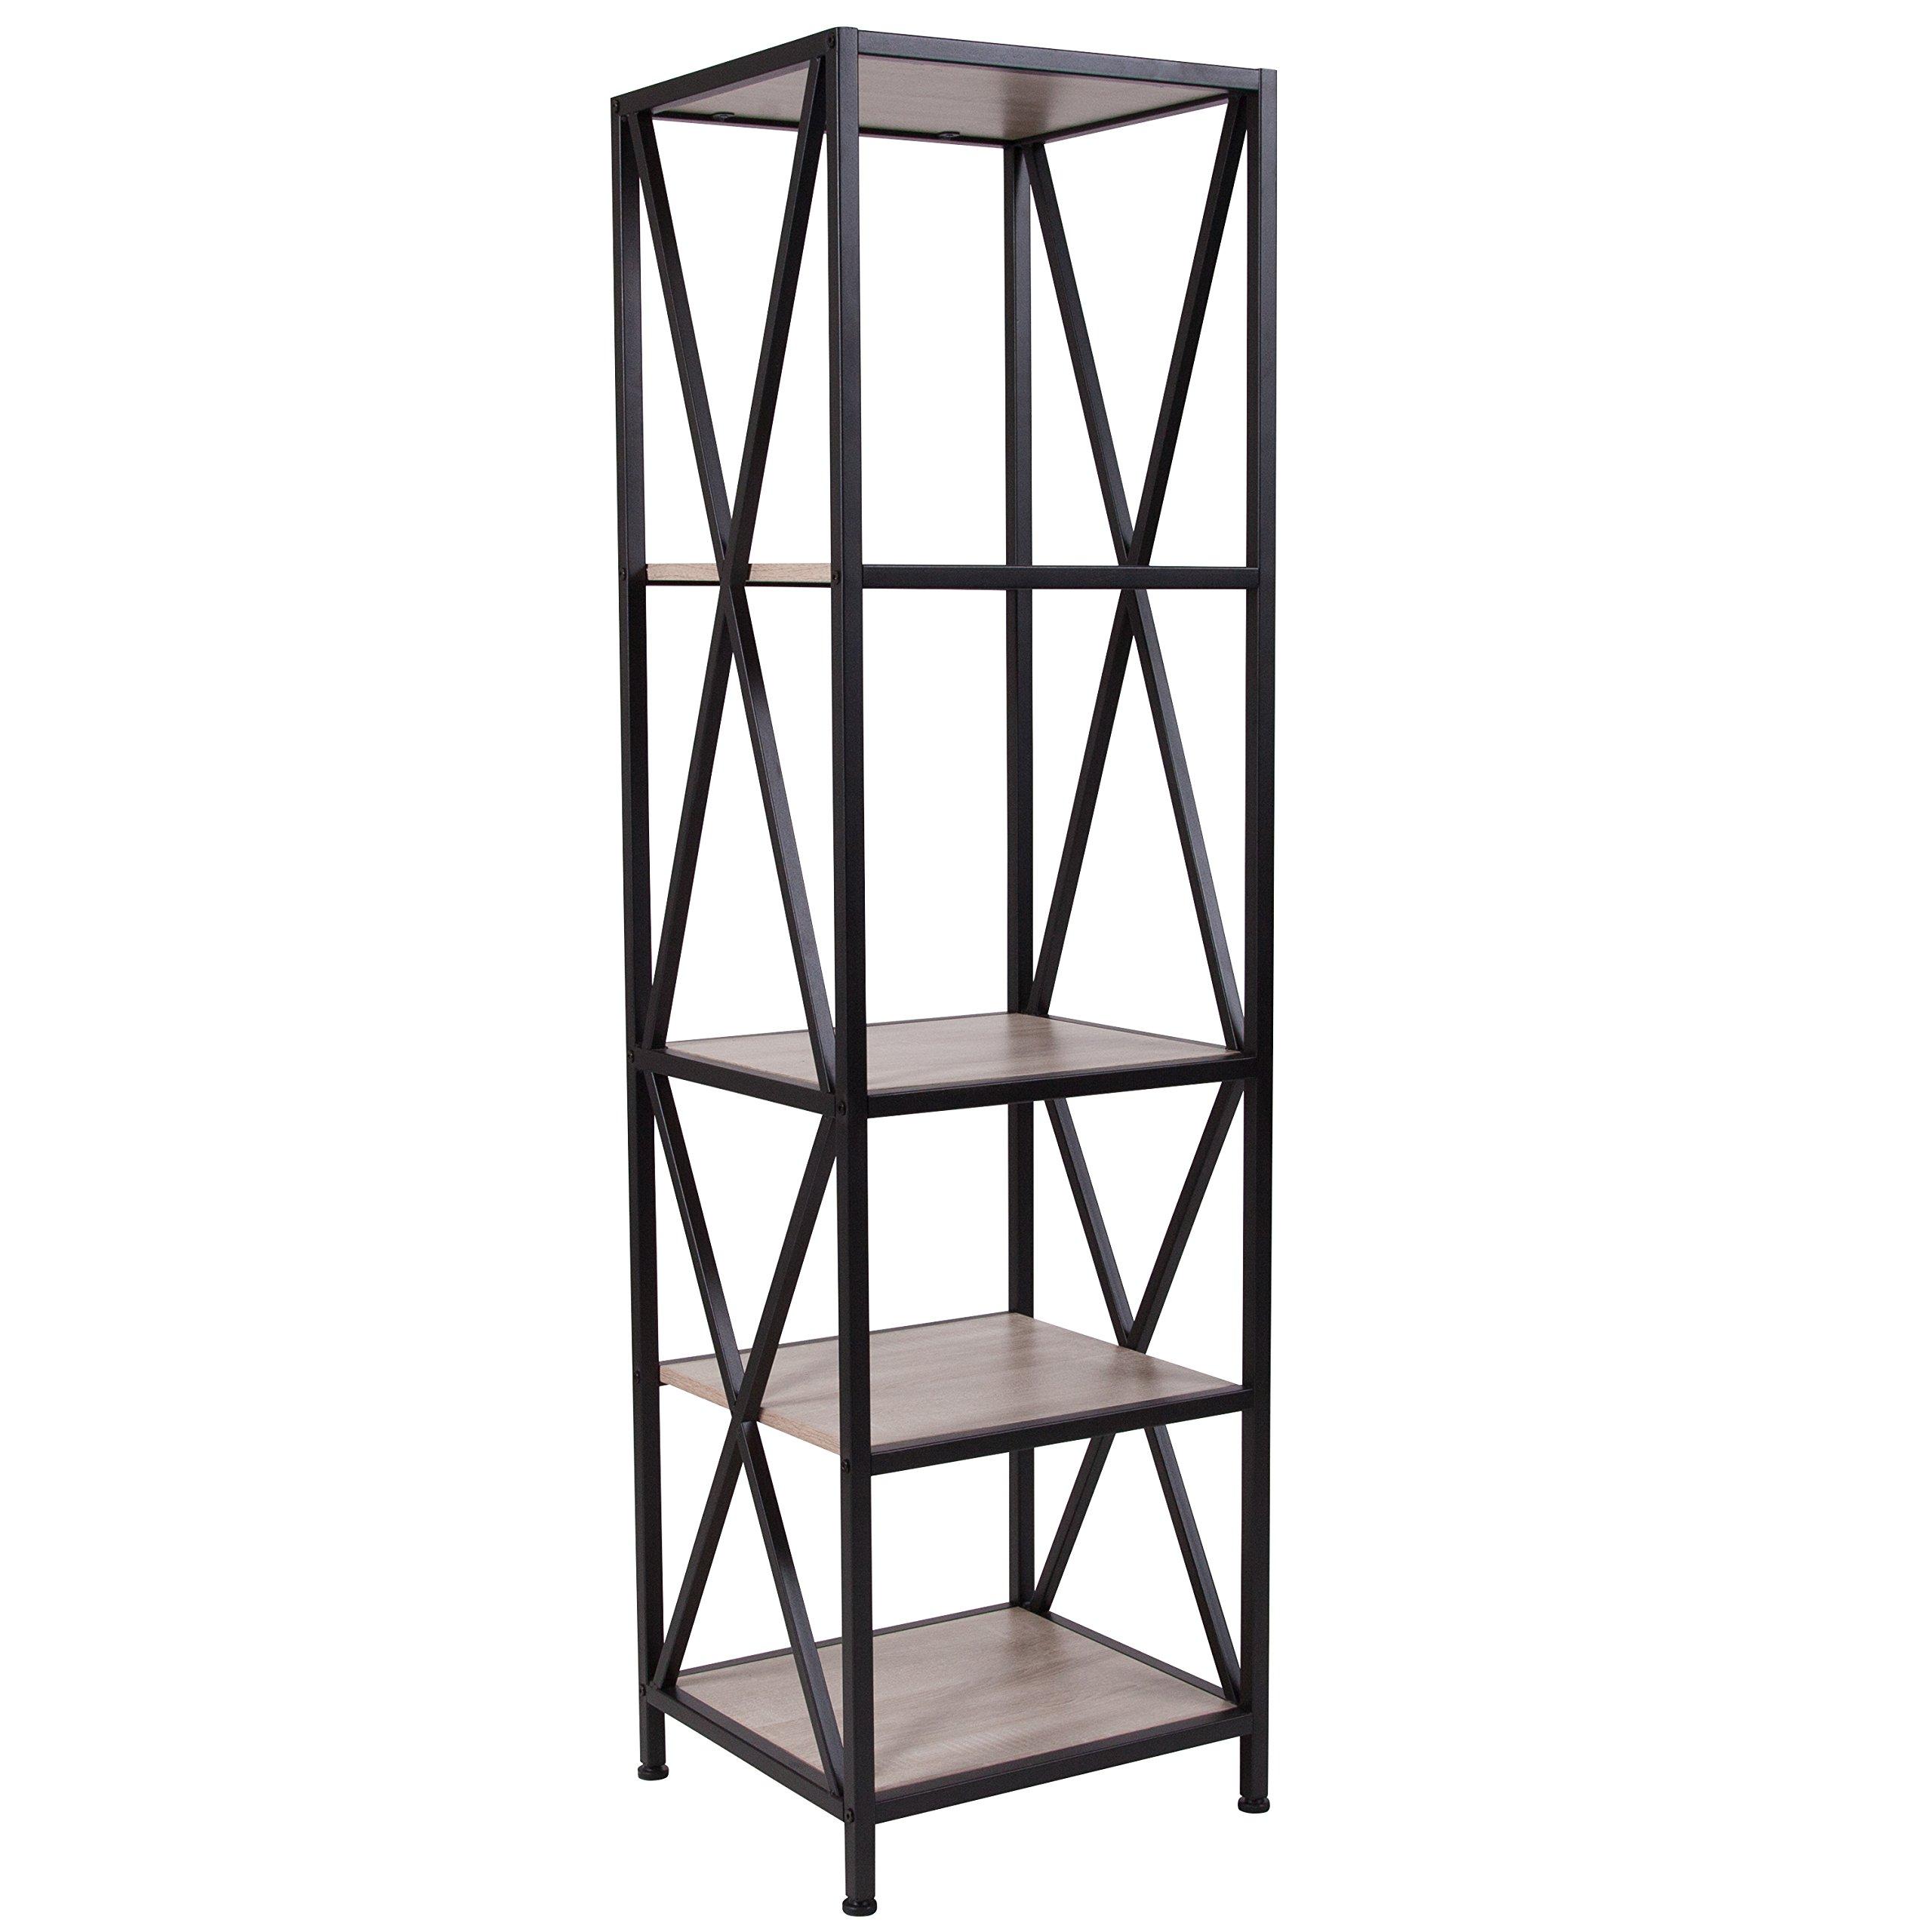 Flash Furniture Chelsea Collection Sonoma Oak Wood Grain Finish Storage Shelf with Metal Frame